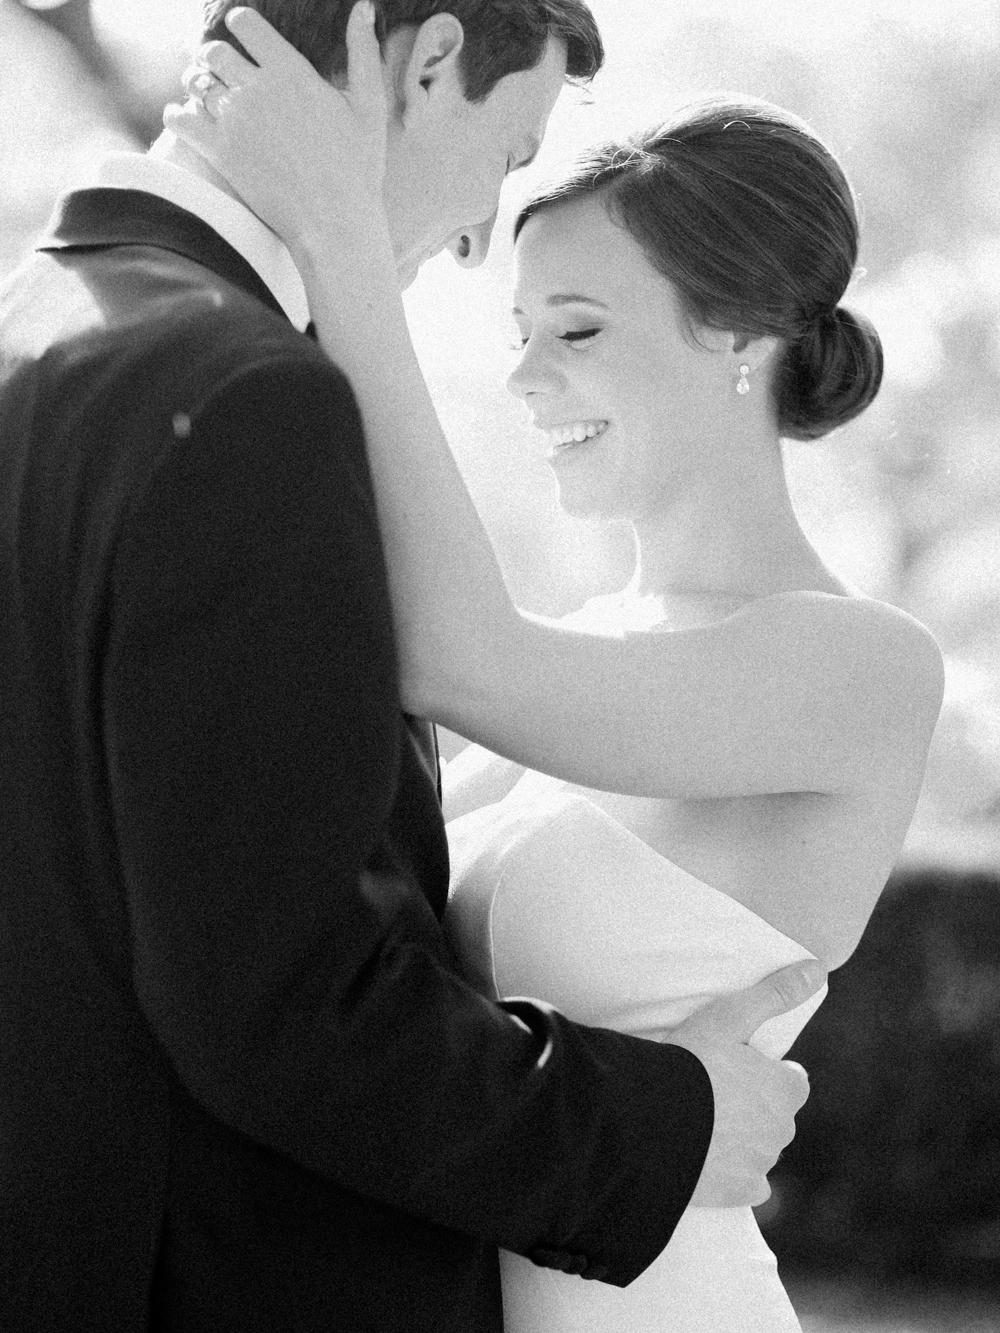 Christine Gosch - destination film photographer - houston wedding photographer - fine art film photographer - elopement photographer - destination wedding - understated wedding - simple beautiful wedding photography-72.jpg